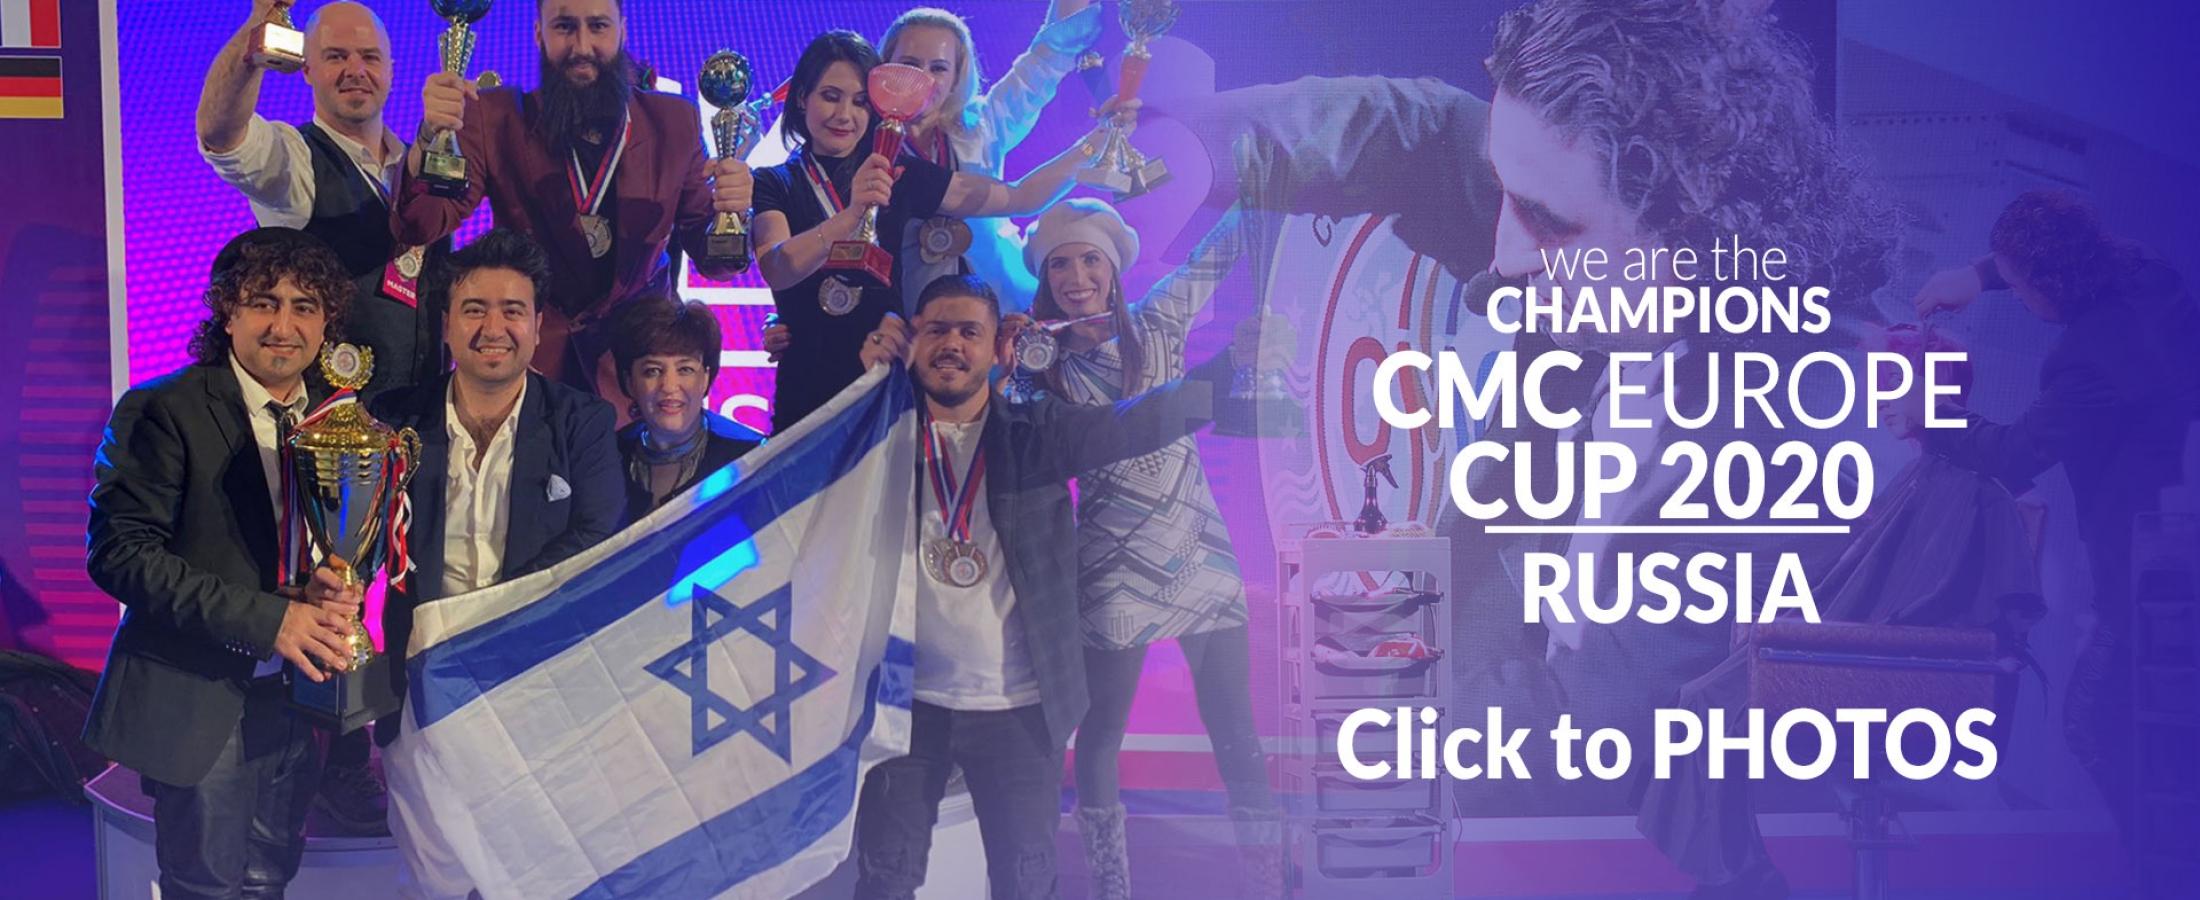 CMC EUROPE CUP 2020 RUSSIA